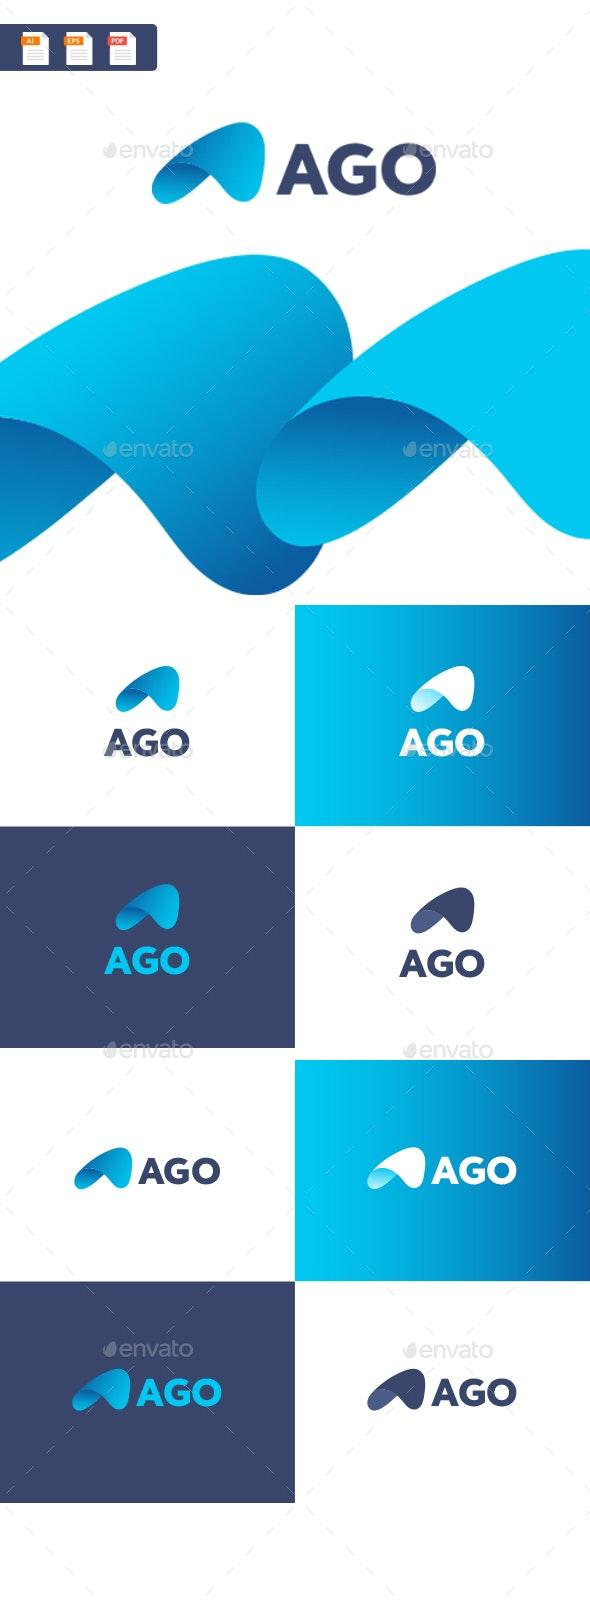 Ago - A abstract letter logo template - Abstract Logo Templates